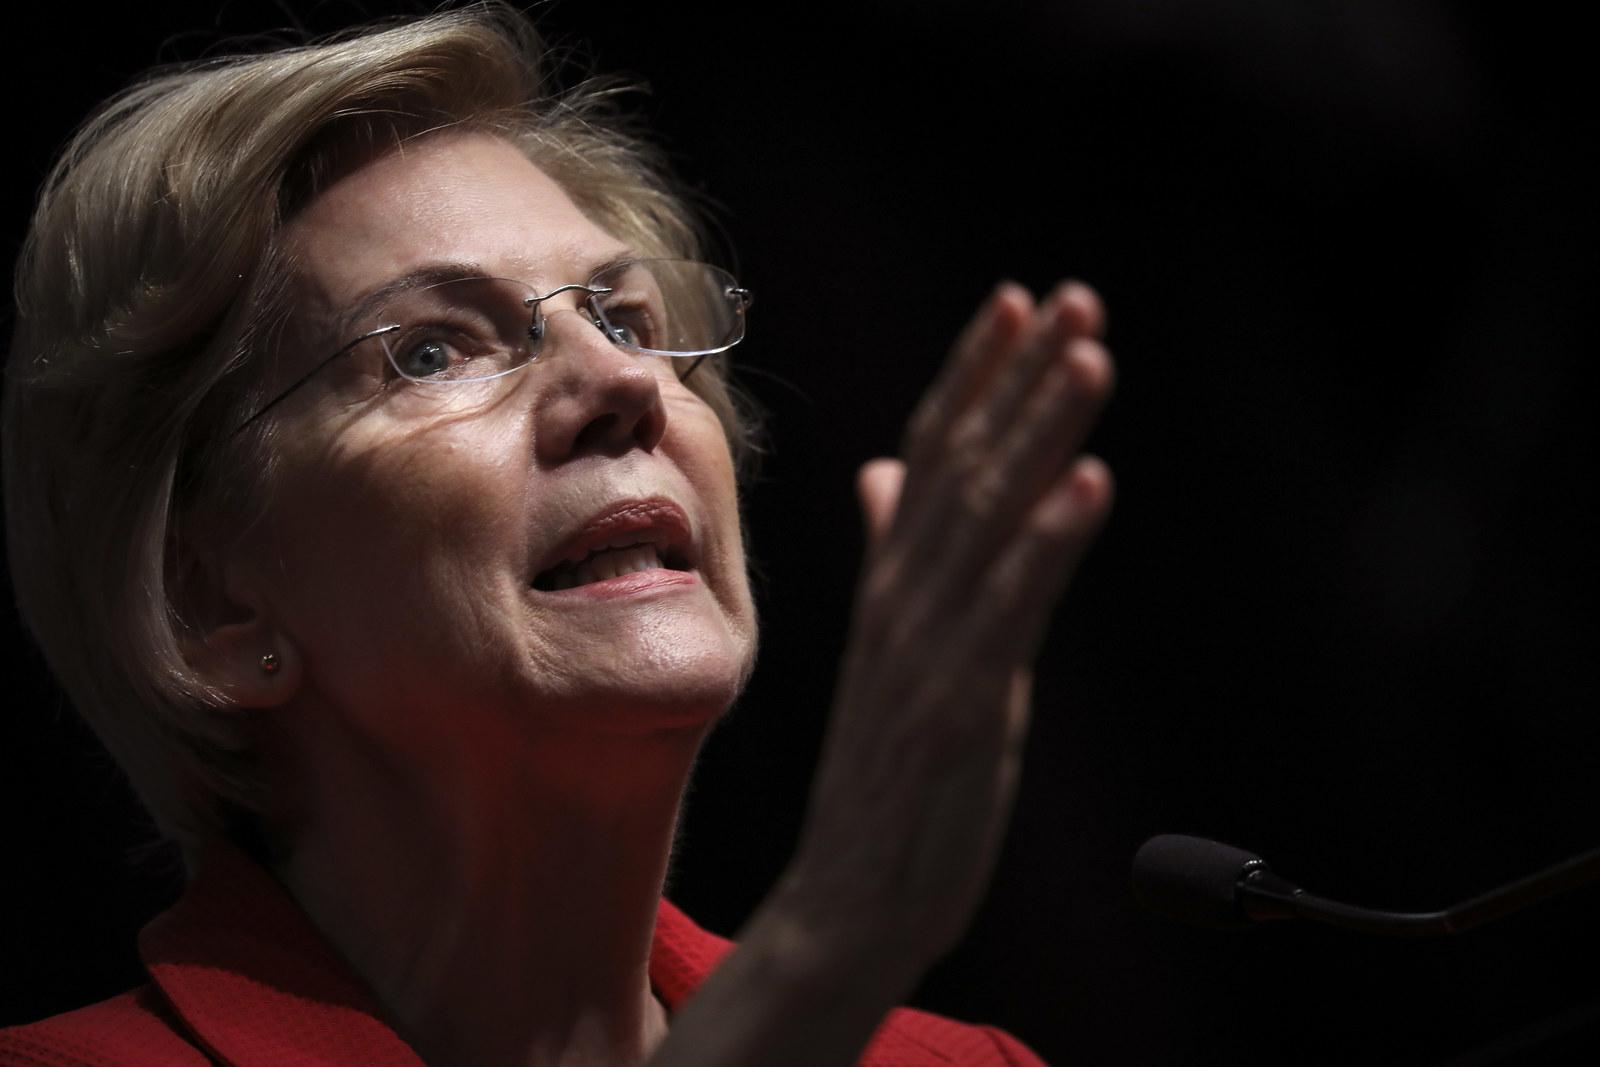 Elizabeth Warren Wants The House To Begin Impeachment Proceedings Against Donald Trump